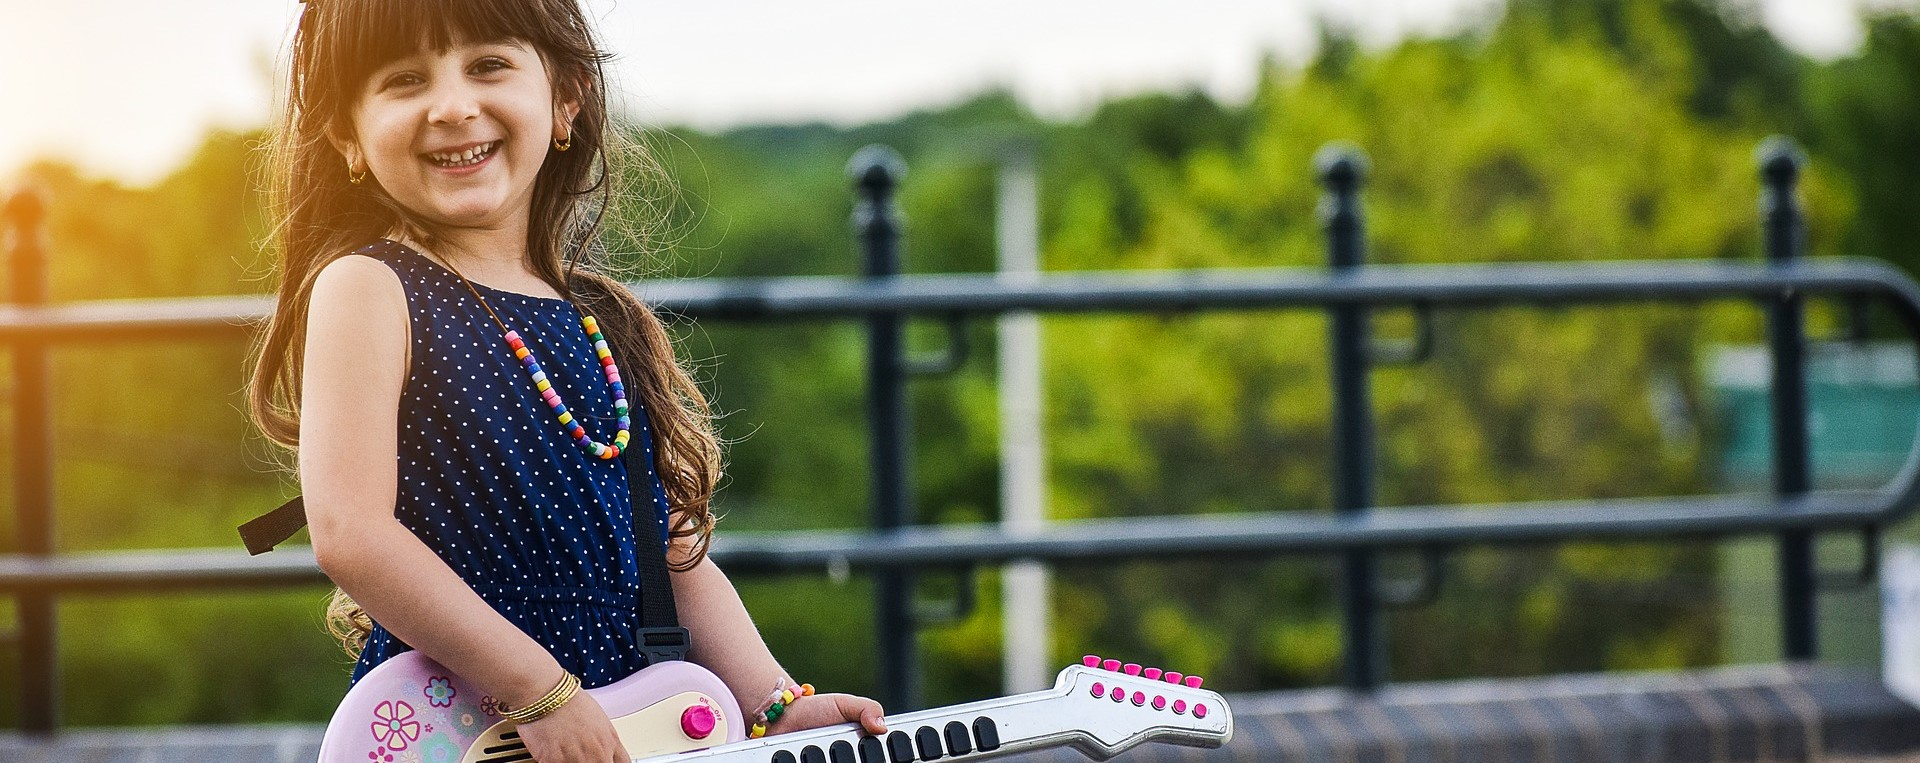 Little Girl in West Virginia enjoying her little guitar | Kids Car Donations